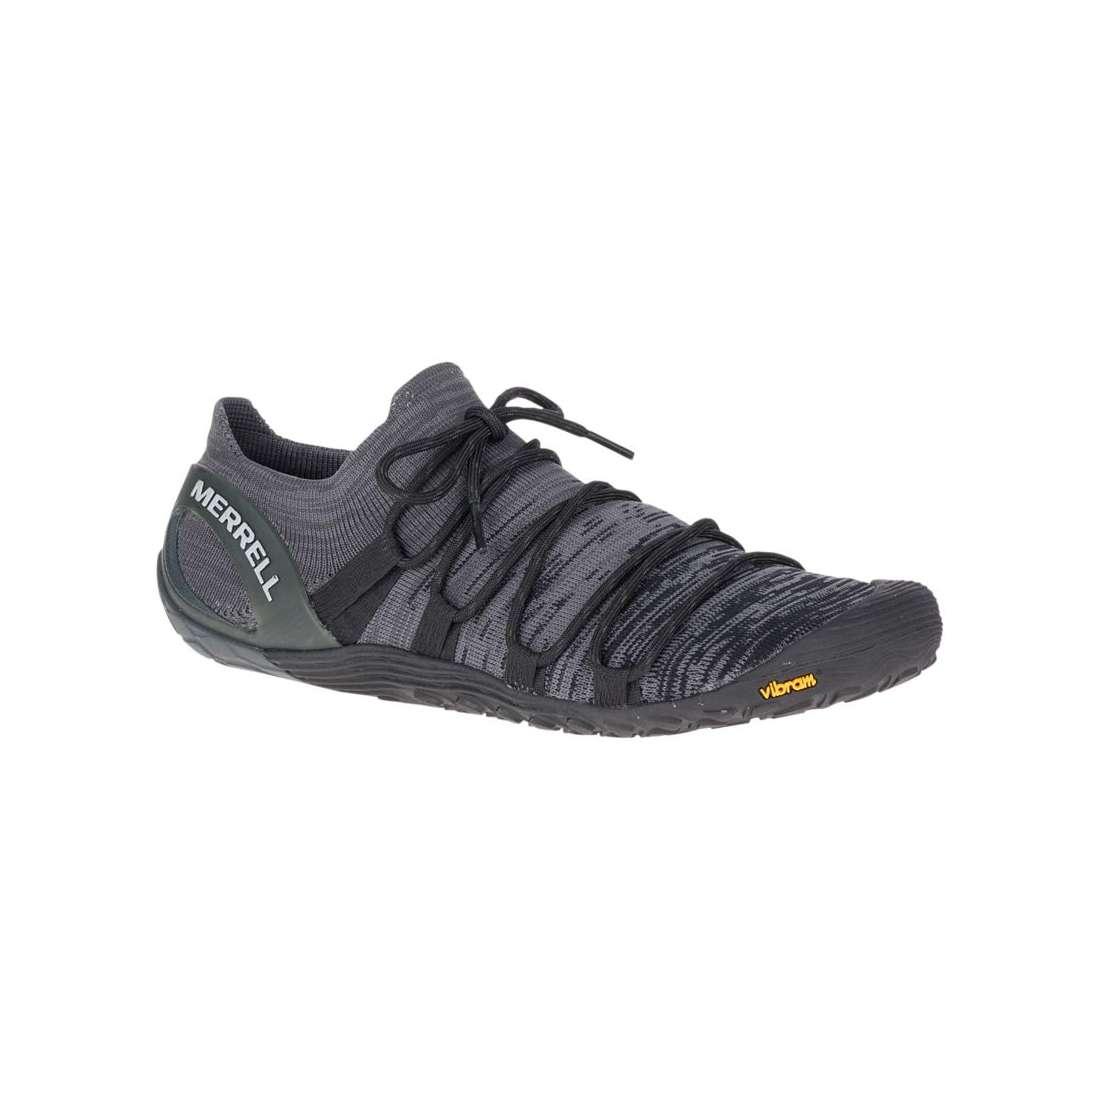 Merrell Vapor Glove 4 3D   Minimalist Shoes 100%